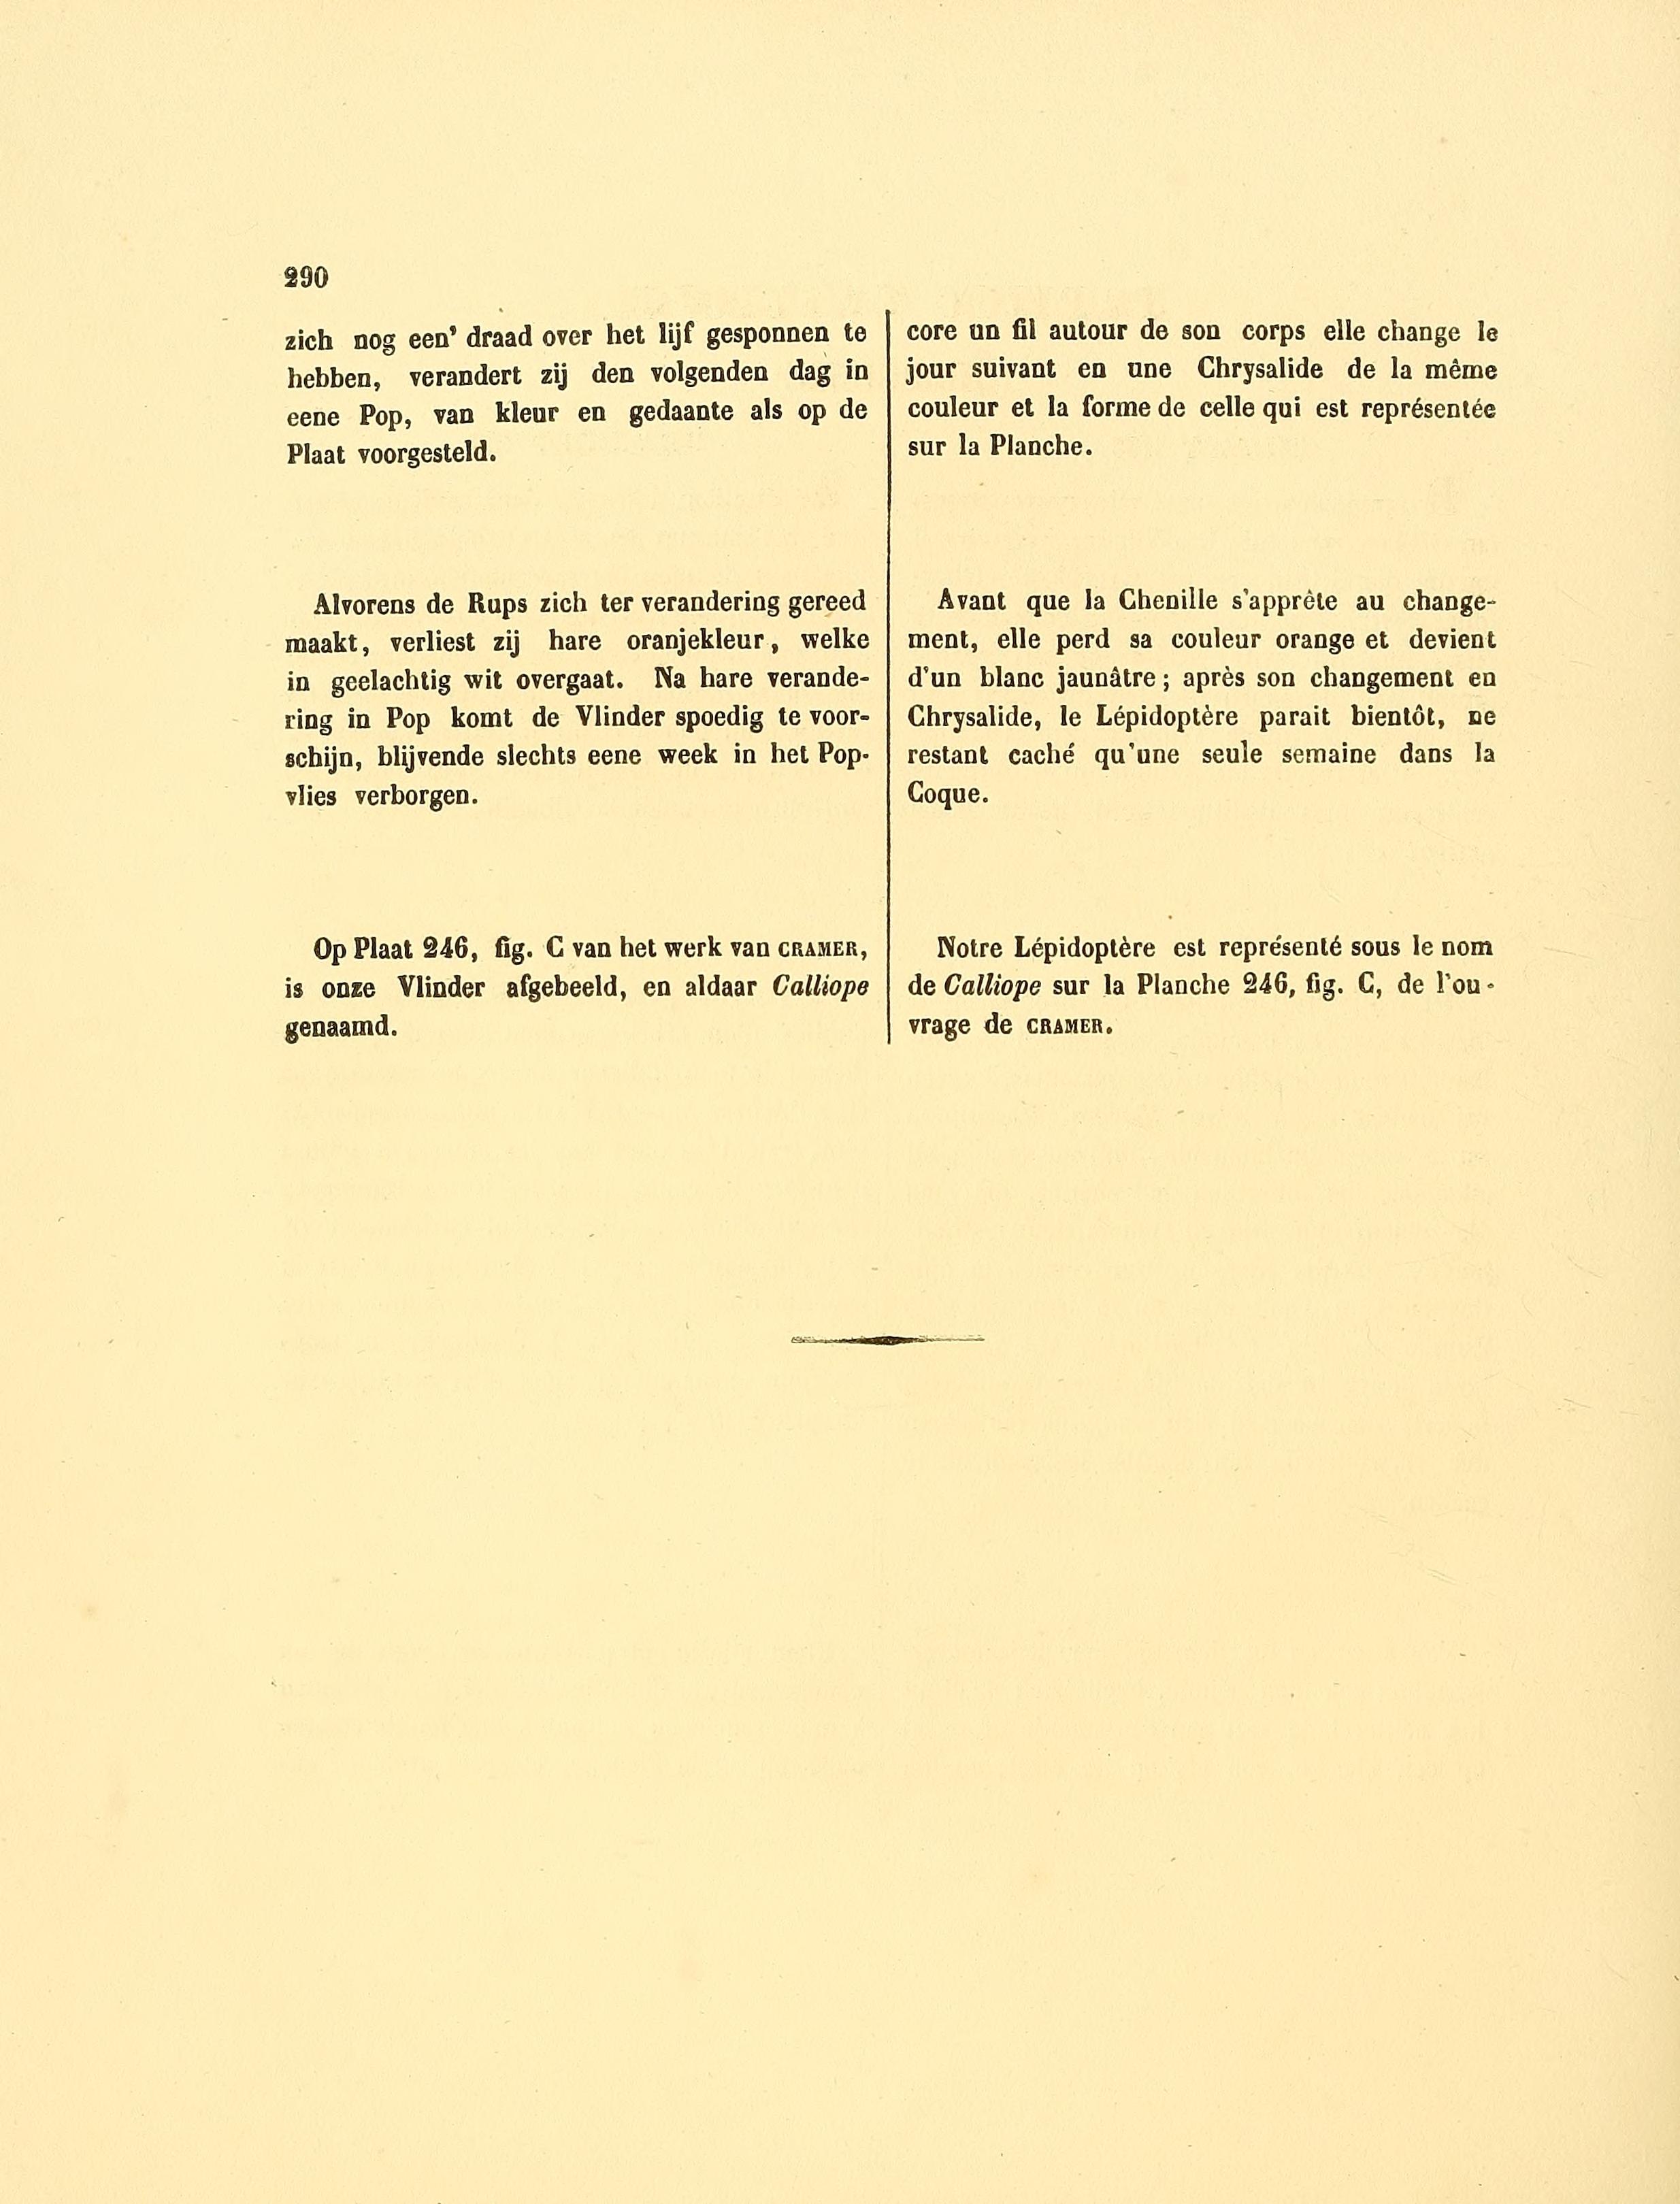 Filesepp Surinaamsche Vlinders Pl 133 Text2 Stalachtis